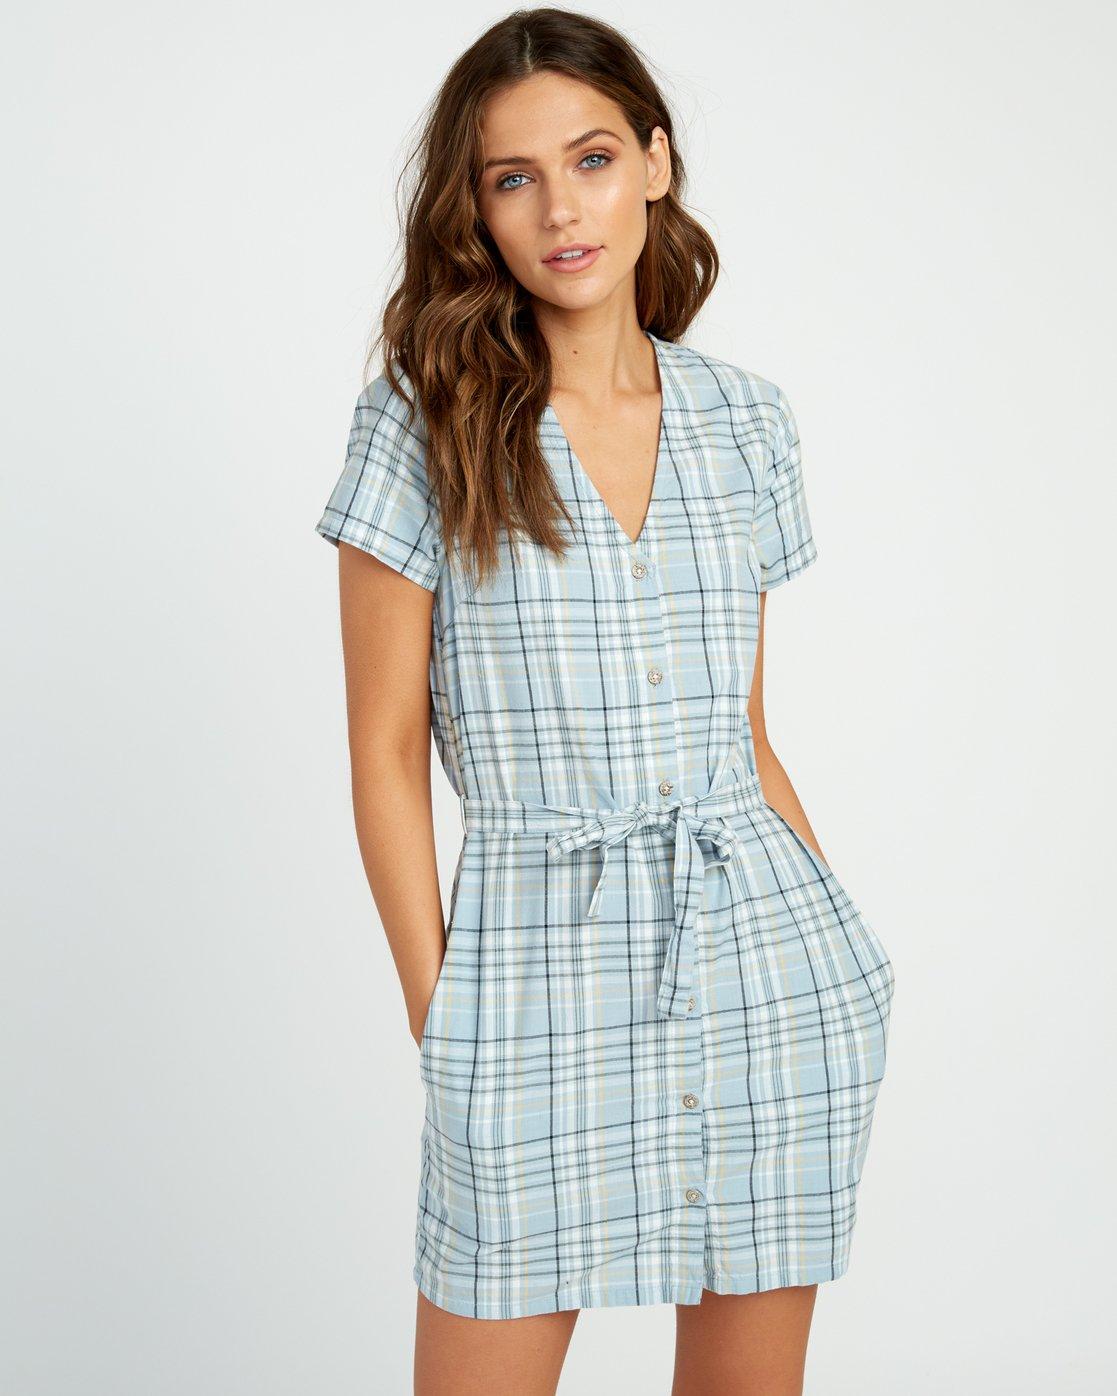 0 Landed Button-Up Dress Blue WD14URLA RVCA